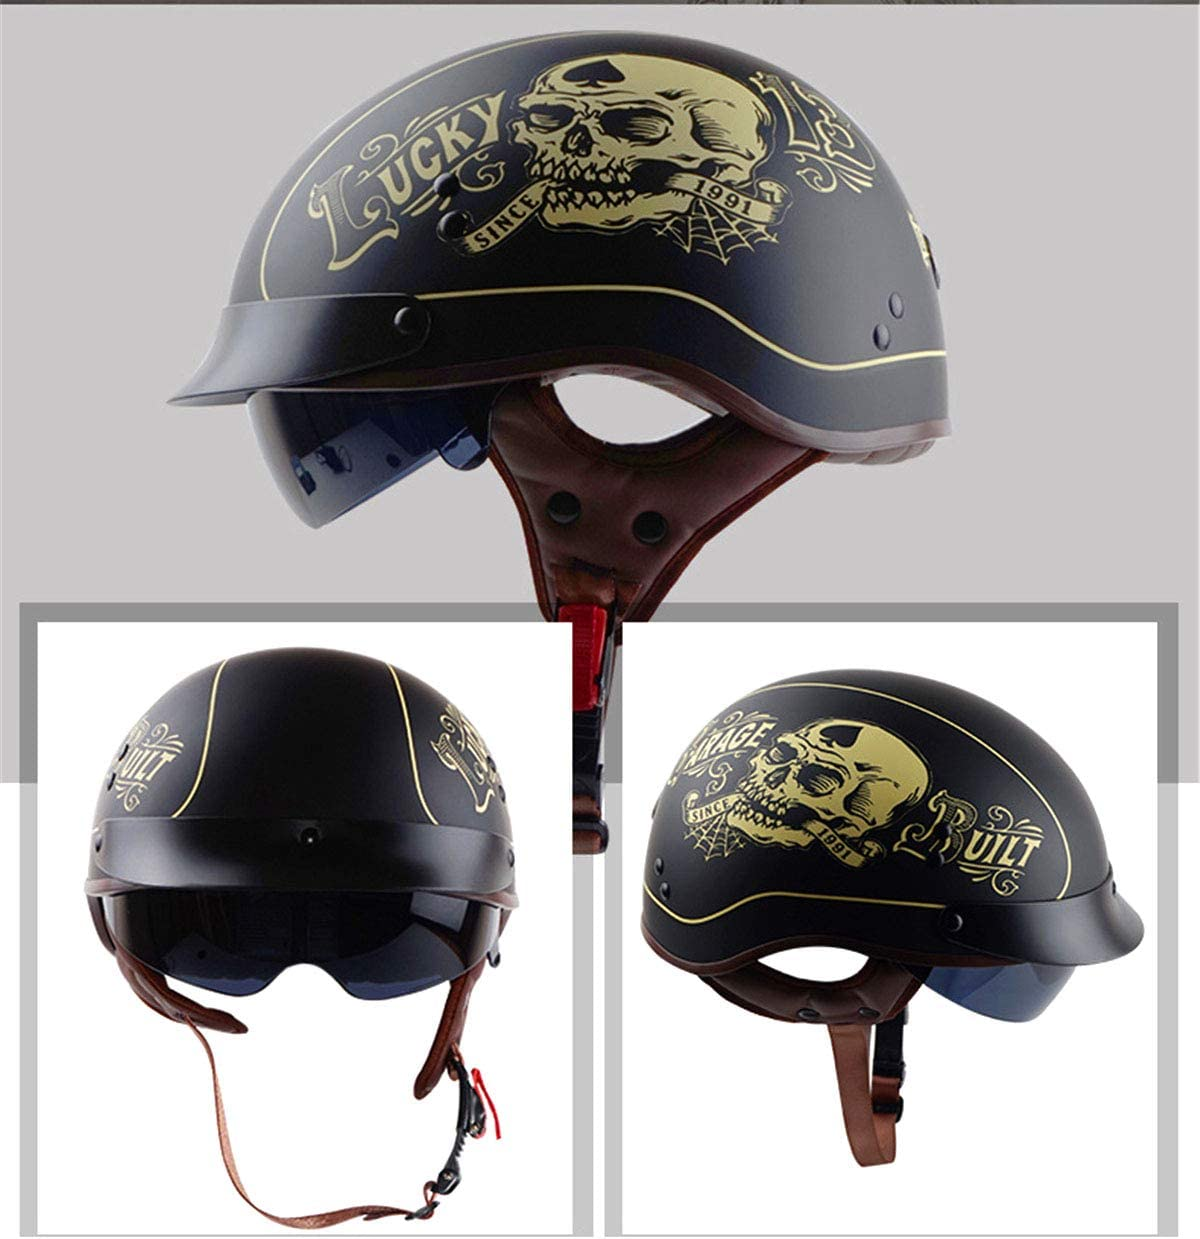 DOT Zertifizierung,M57~58cm YXNB/® Brain-Cap /· Halbschale Jet-Helm Motorrad-Helm Matt Black Motorrad Half Helm mit Drop Visier f/ür Cruiser Chopper Biker Lucky Skull